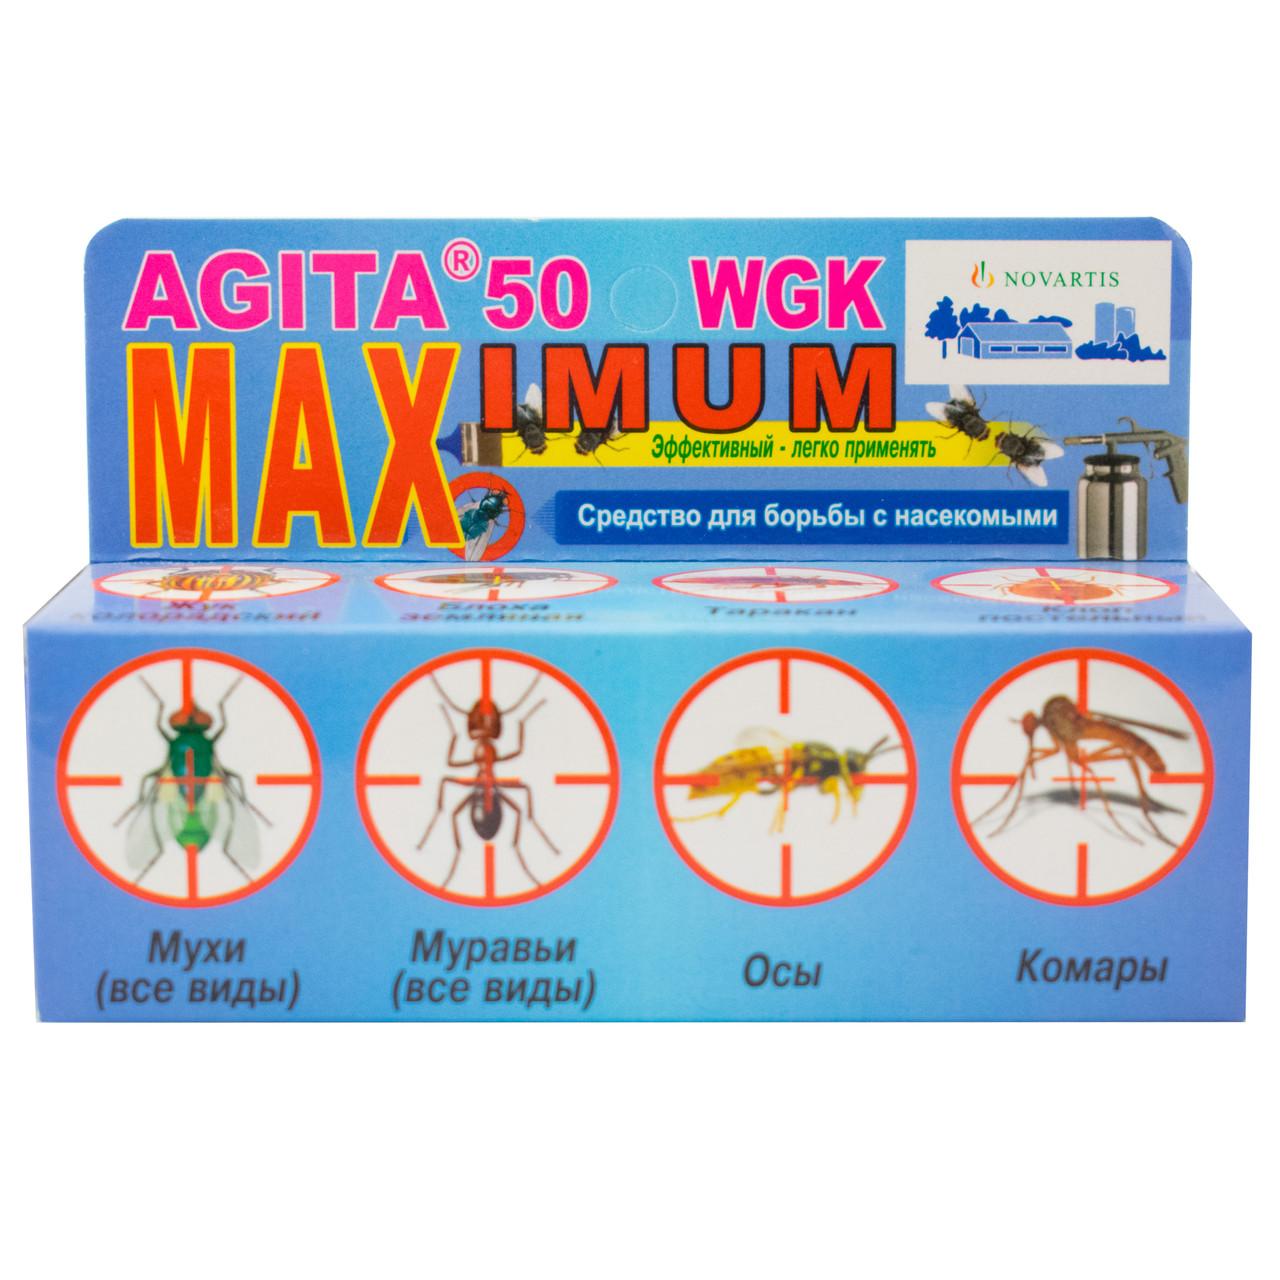 Гранулы от мух Агита Maximum 50 WGK 60 г